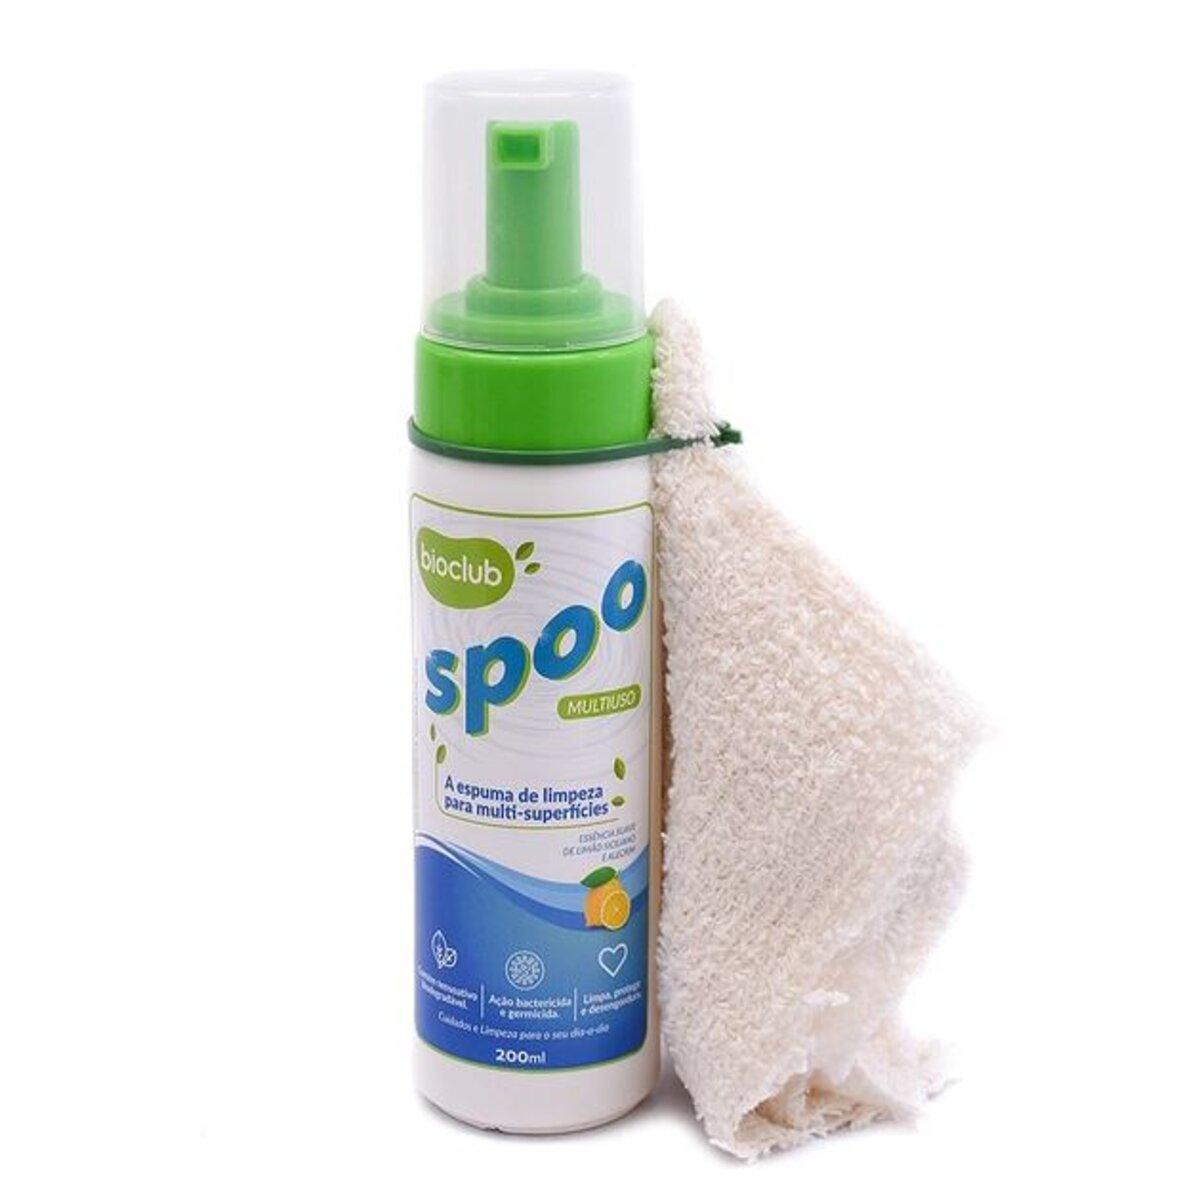 Espuma Limpeza Multiuso Spoo 200ml - Bioclub